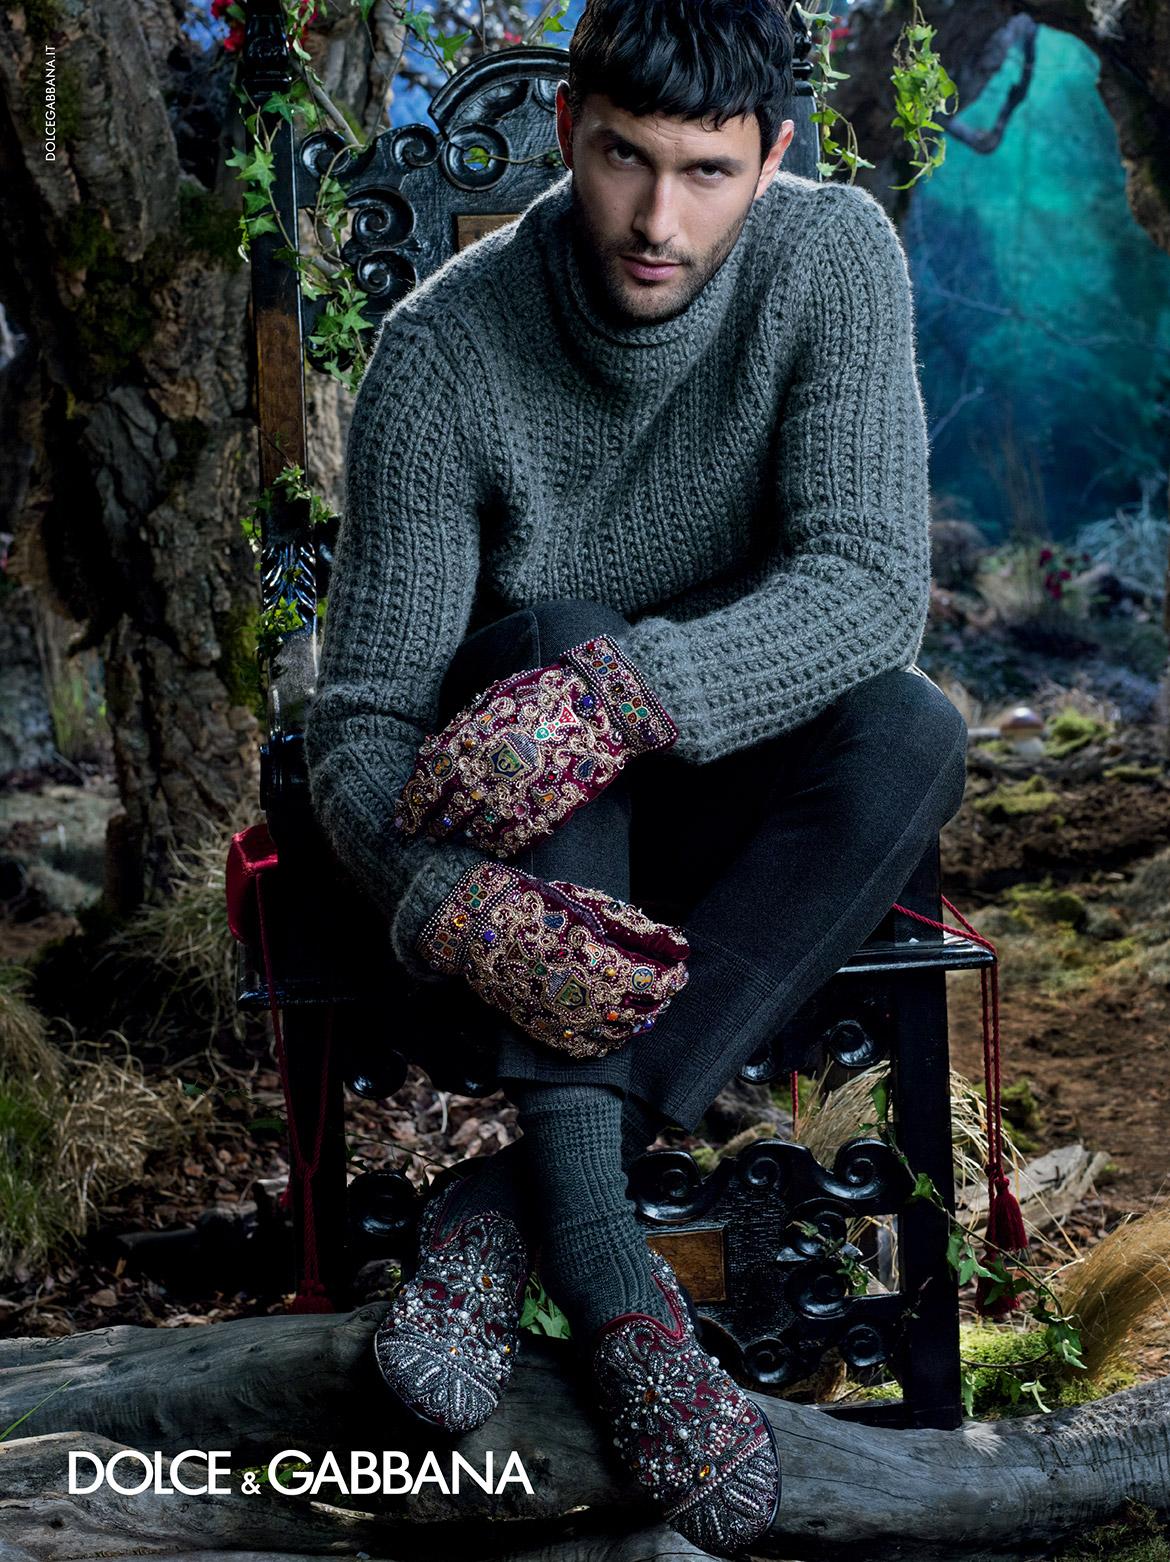 Dolce gabbana fall winter 2014 fashionably male - Mobeldesigner italien ...